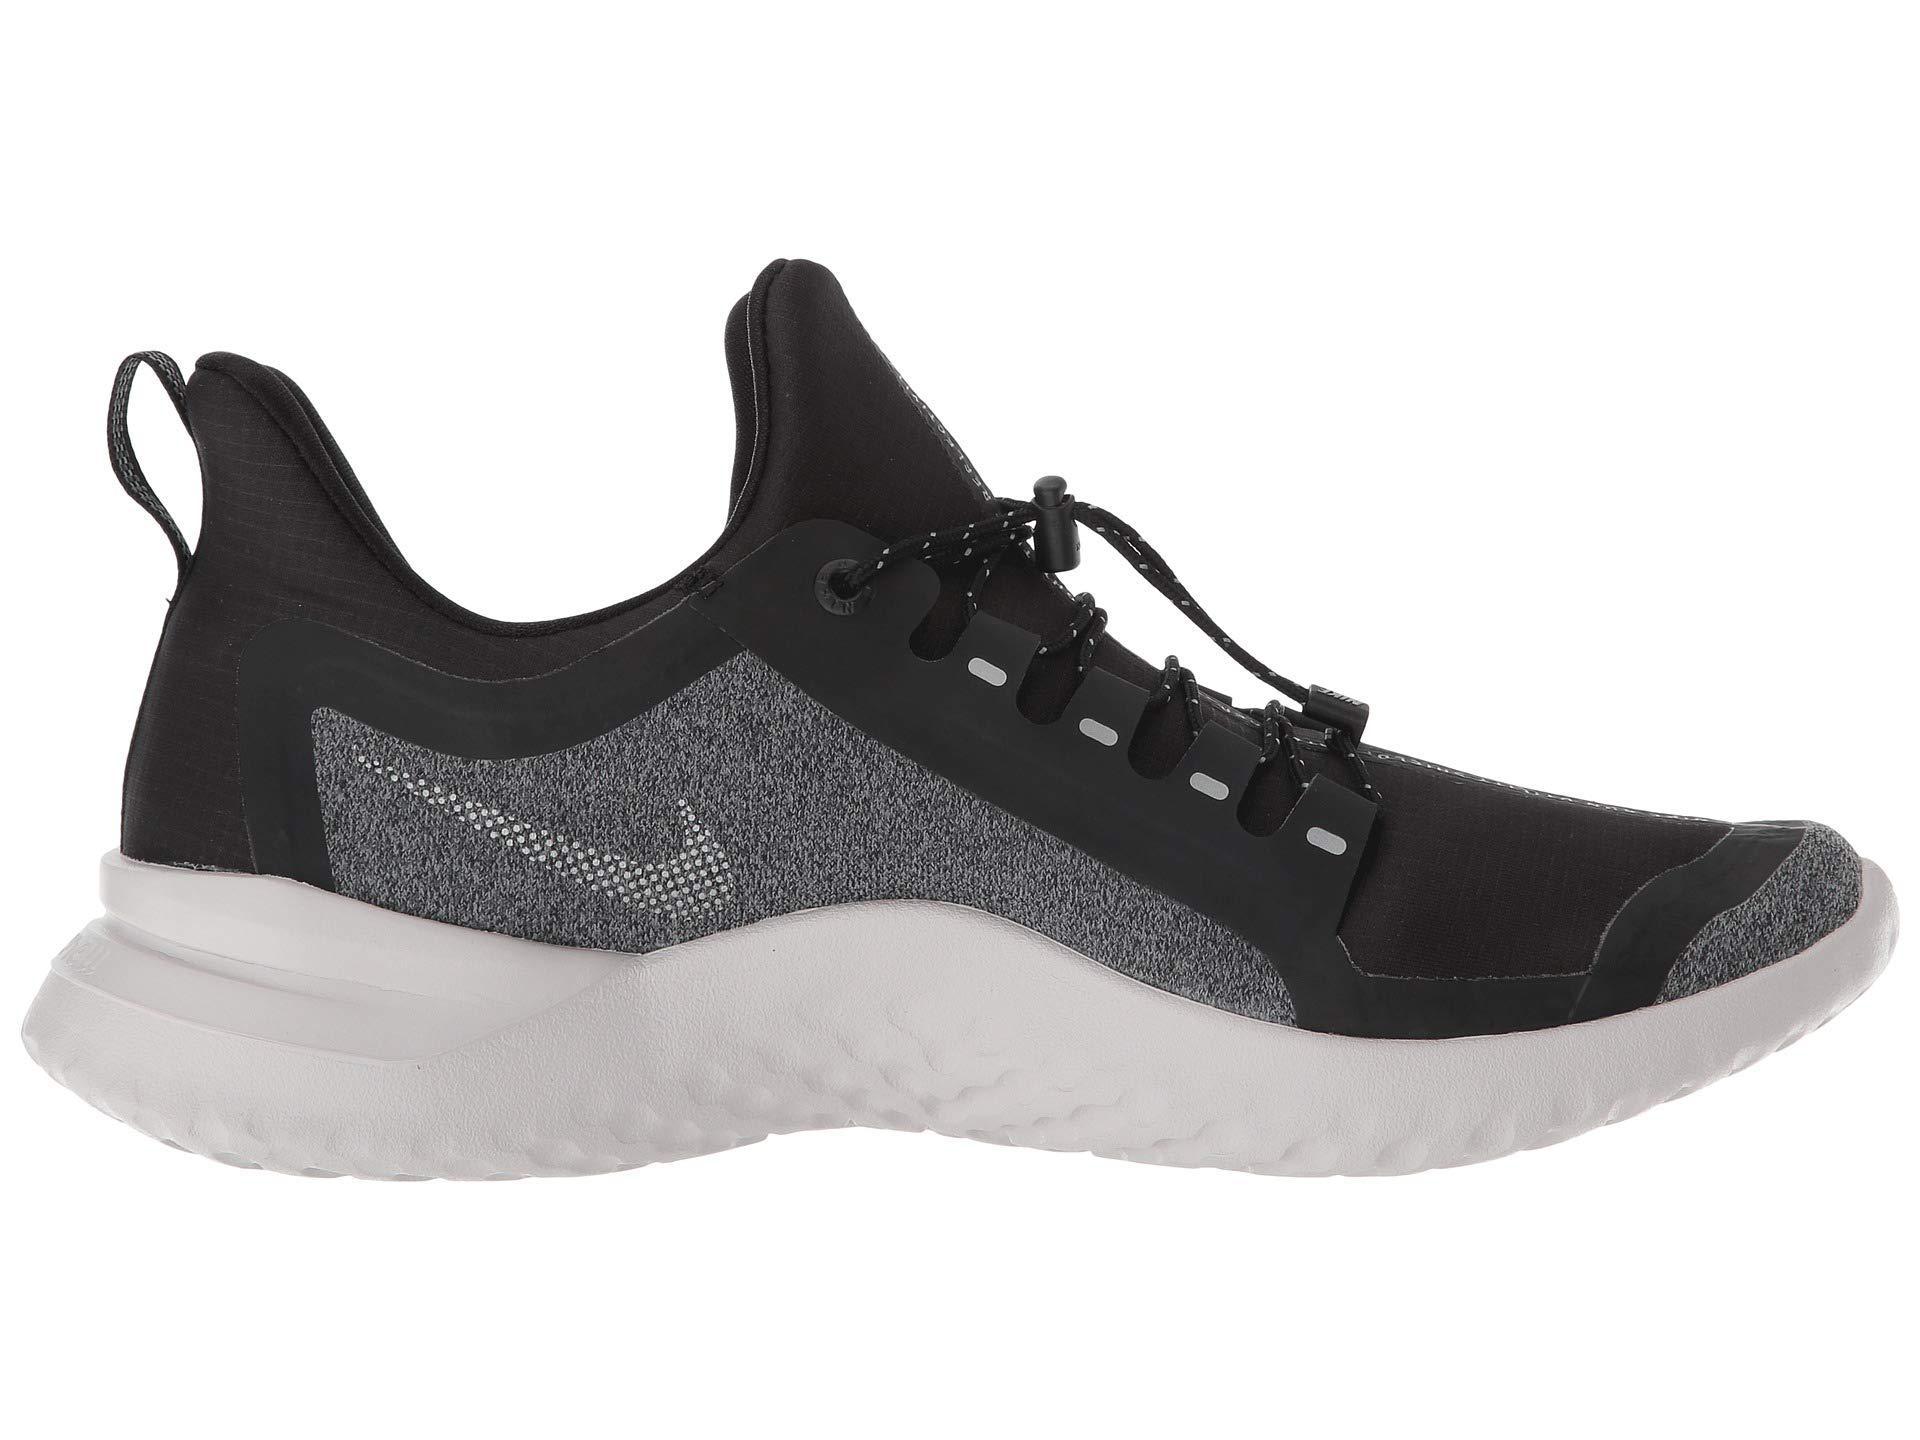 new style e4258 49bcf Lyst - Nike Renew Rival Shield (black metallic Silver cool Grey) Men s  Running Shoes in Metallic for Men